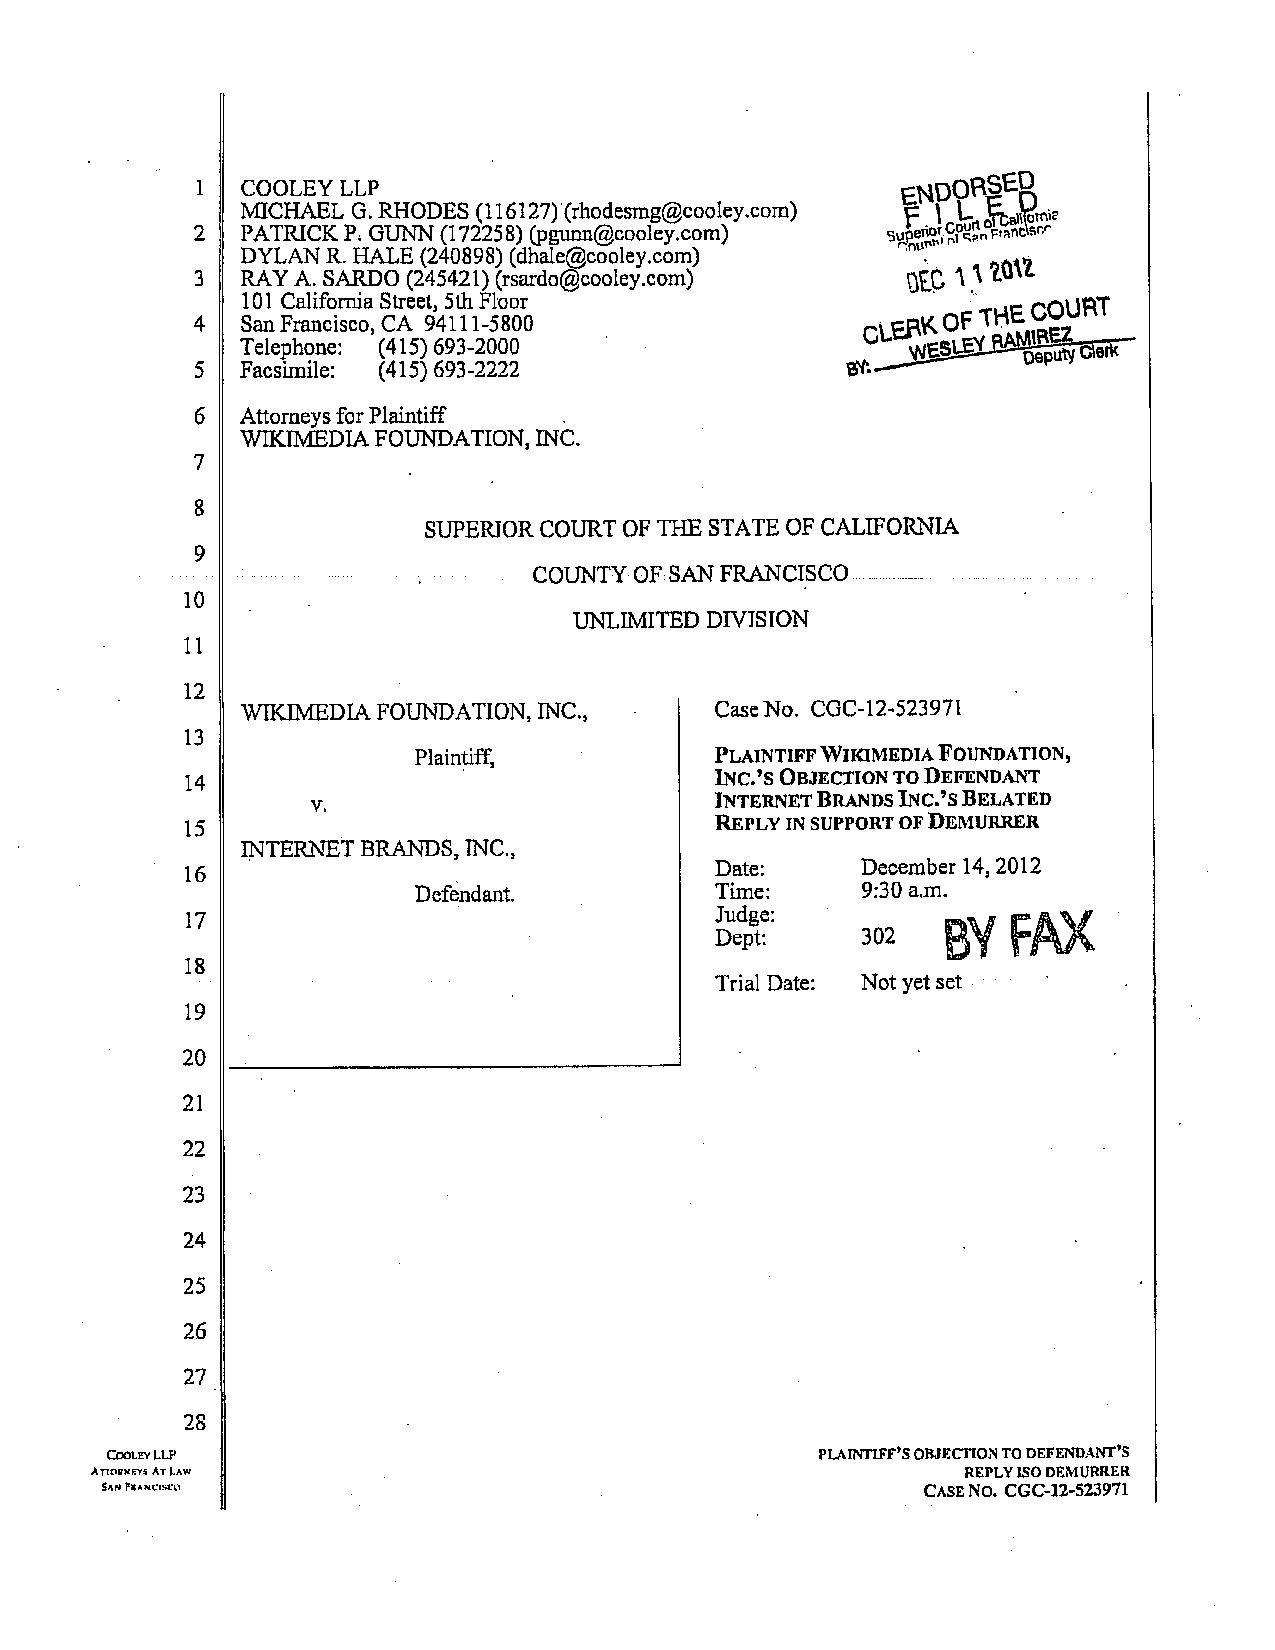 Objection To Defendant S Expert Designation